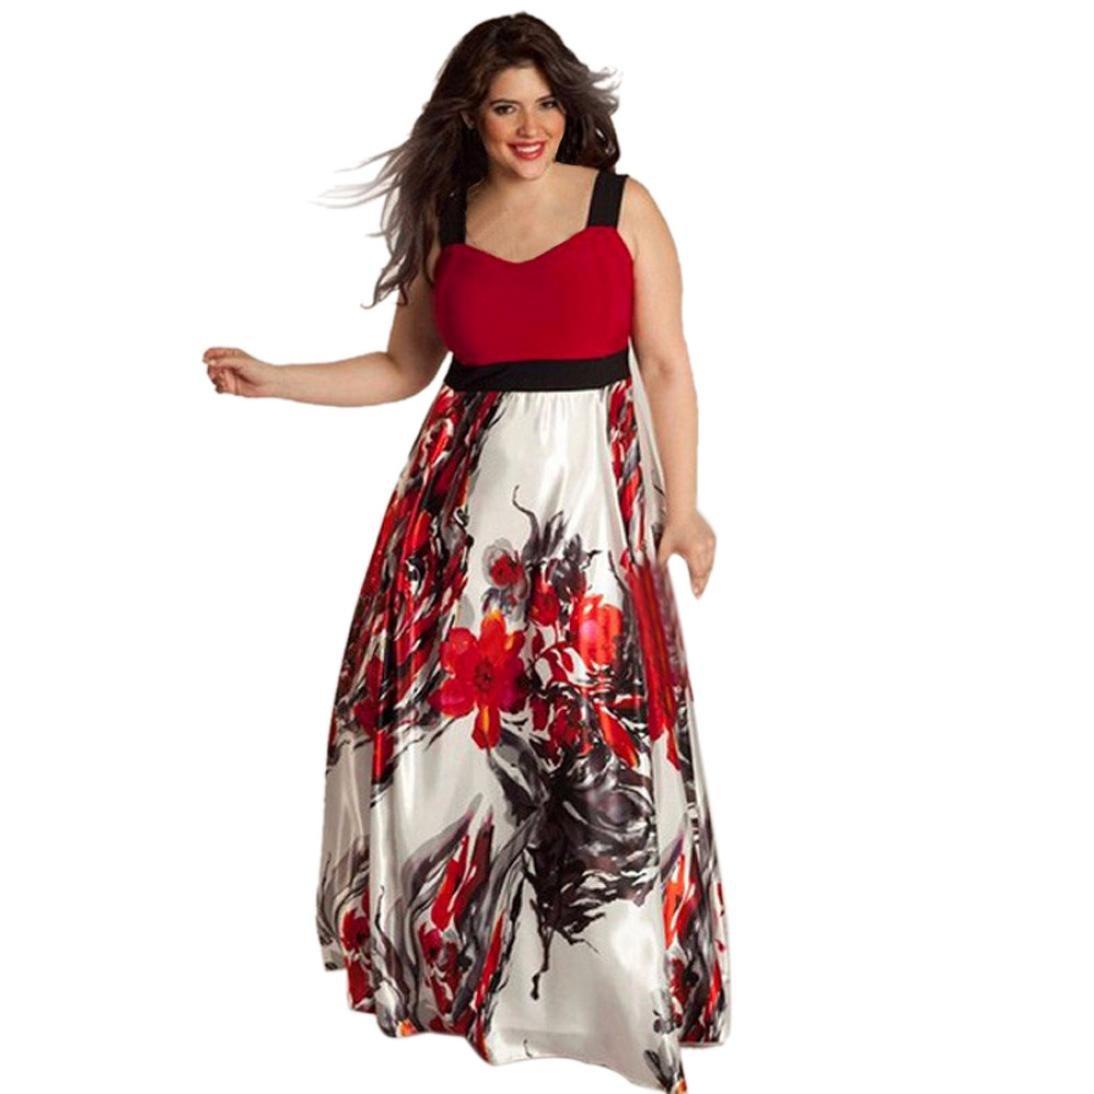 Fapizi Clearancewomen Dresshot Plus Size Ladiesfloralprinted